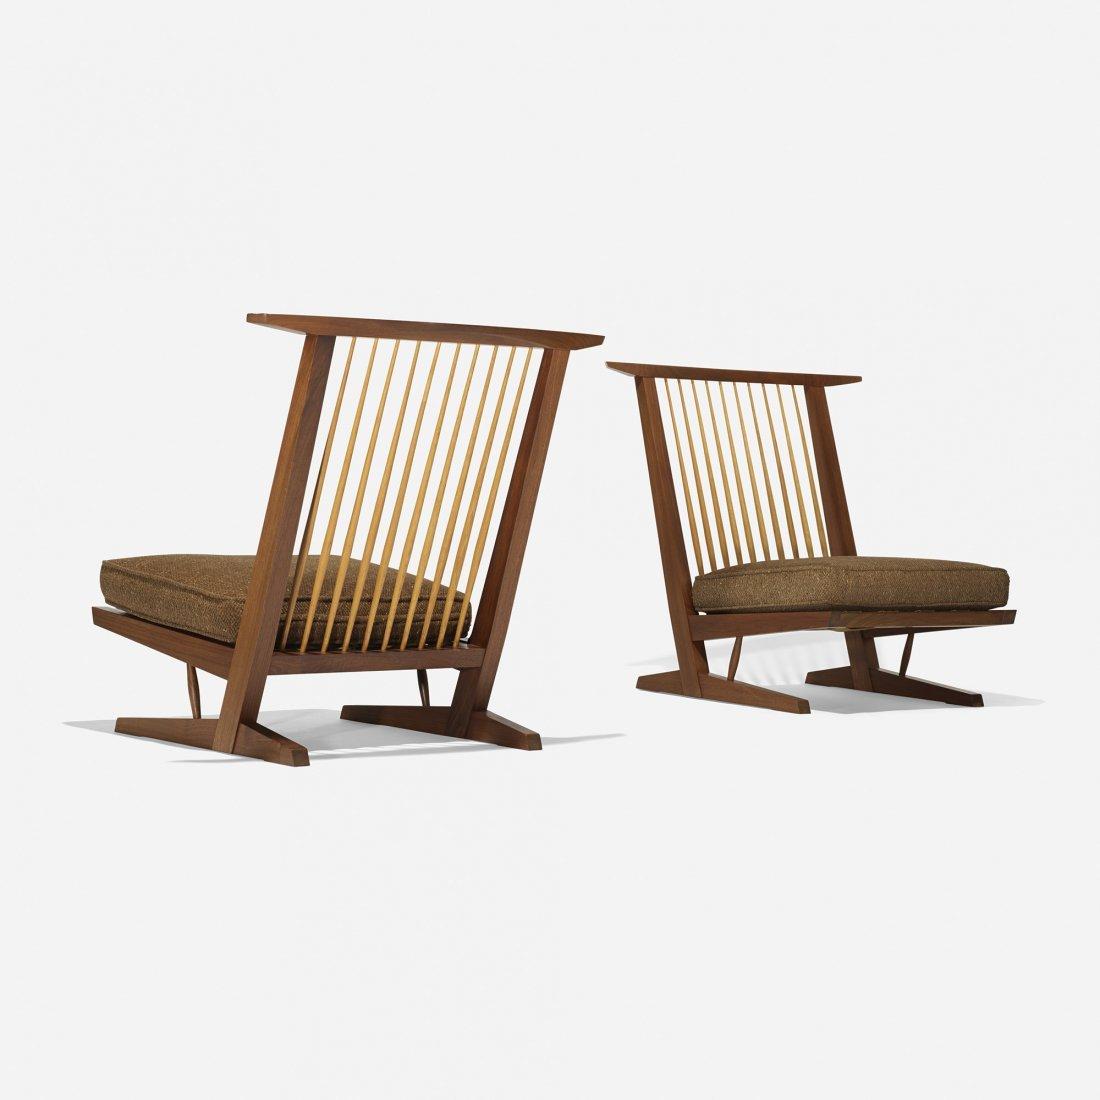 George Nakashima Conoid Cushion chairs, pair